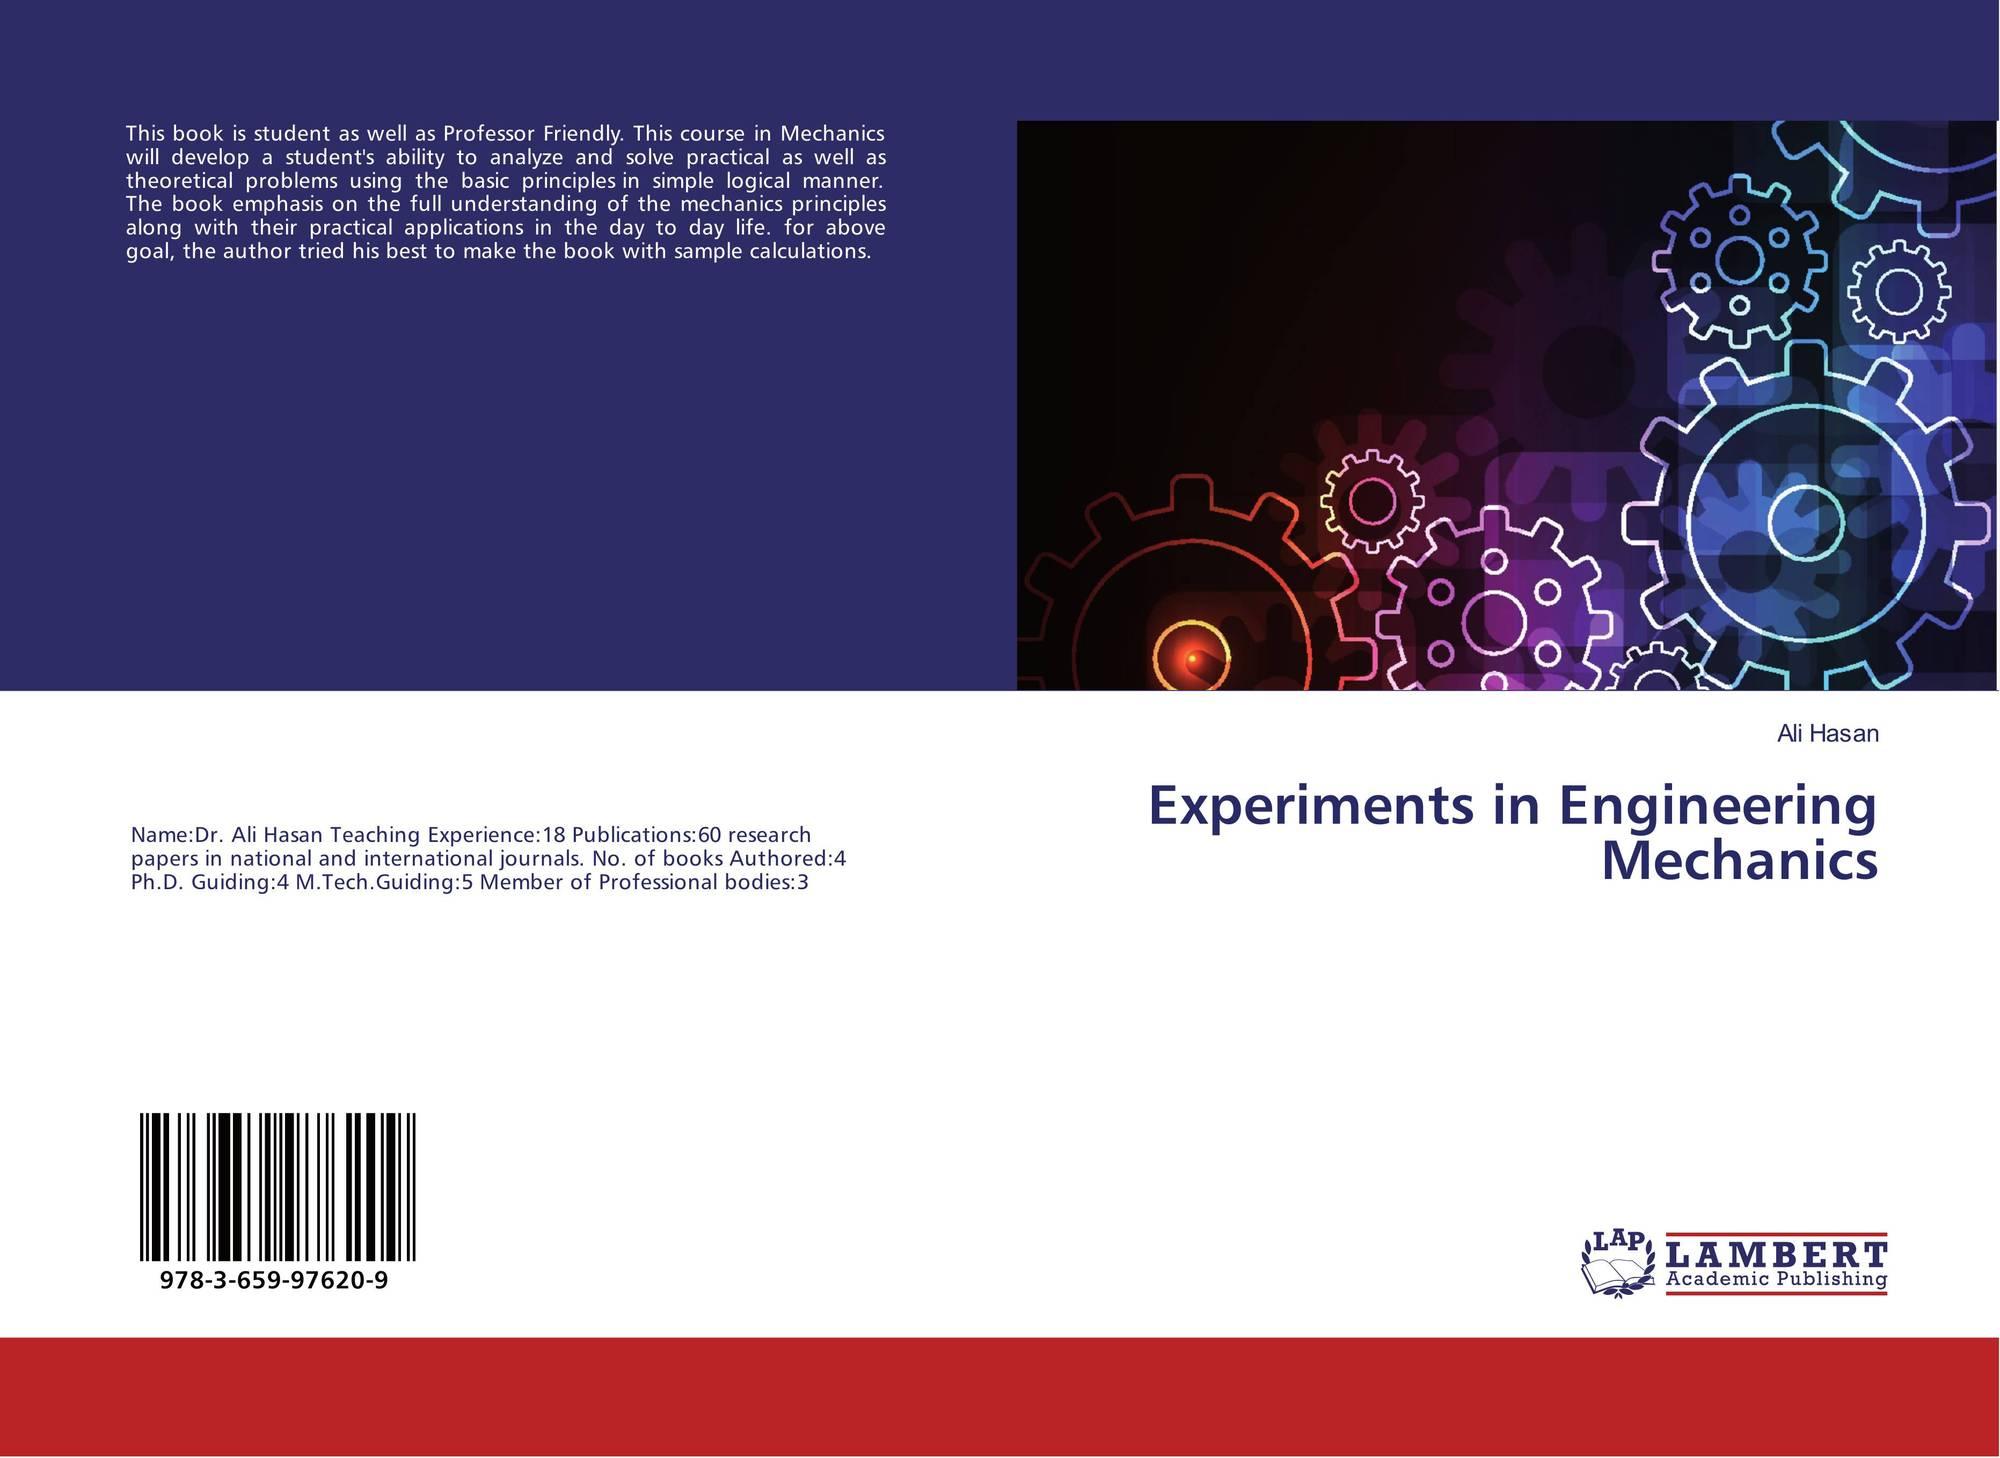 Experiments in Engineering Mechanics, 978-3-659-97620-9